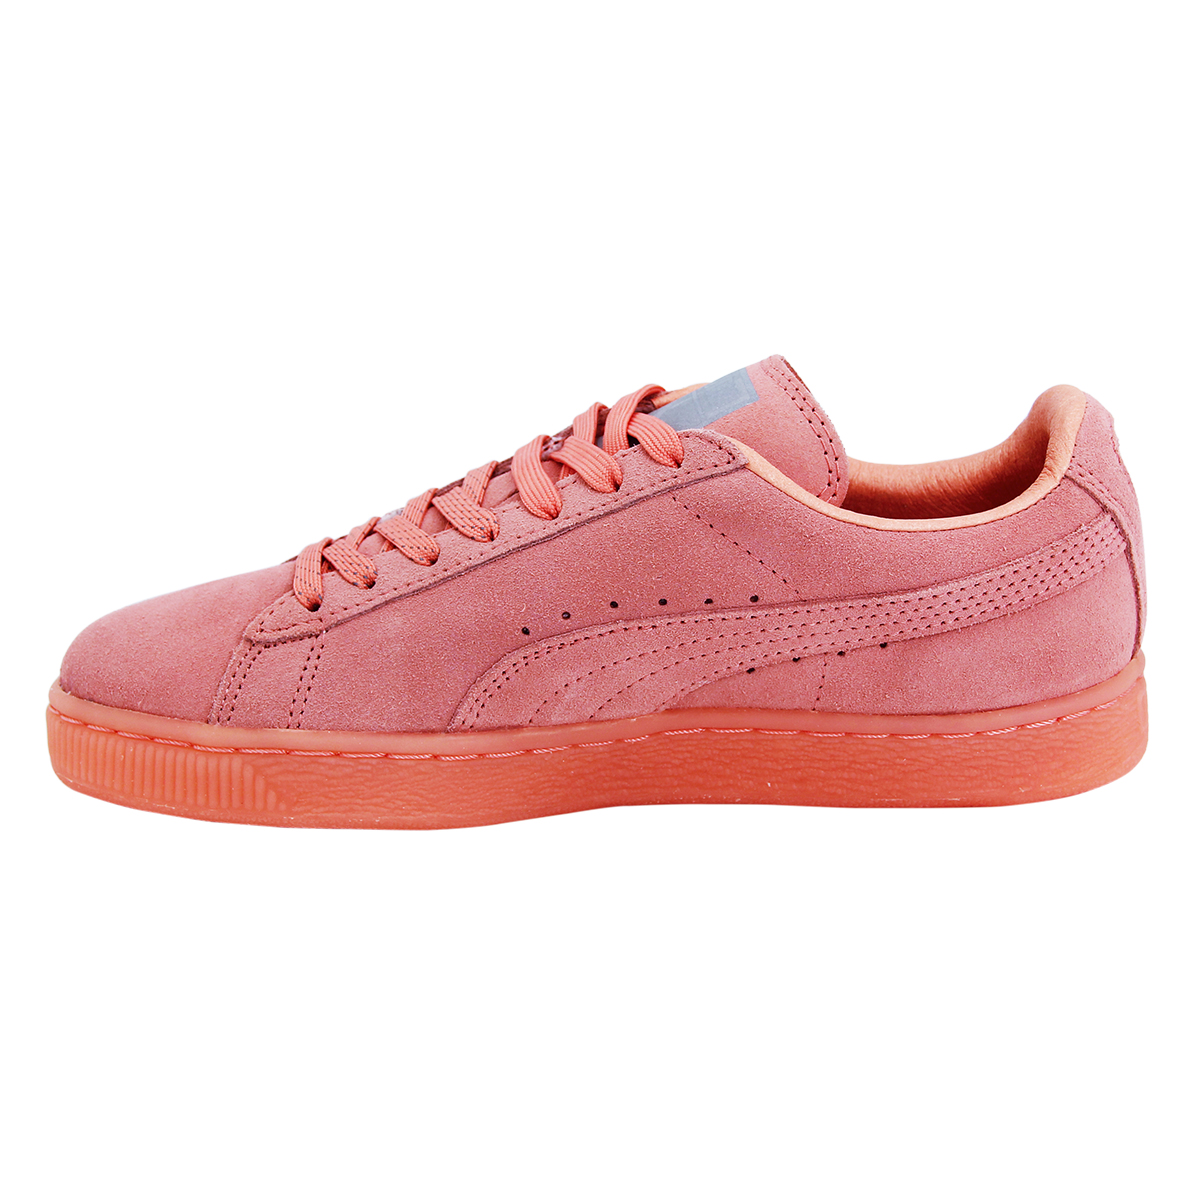 Sneakers Nouveau Puma Suede Chaussures Suede Ortholite Wns Mono ZqqCIpw7x